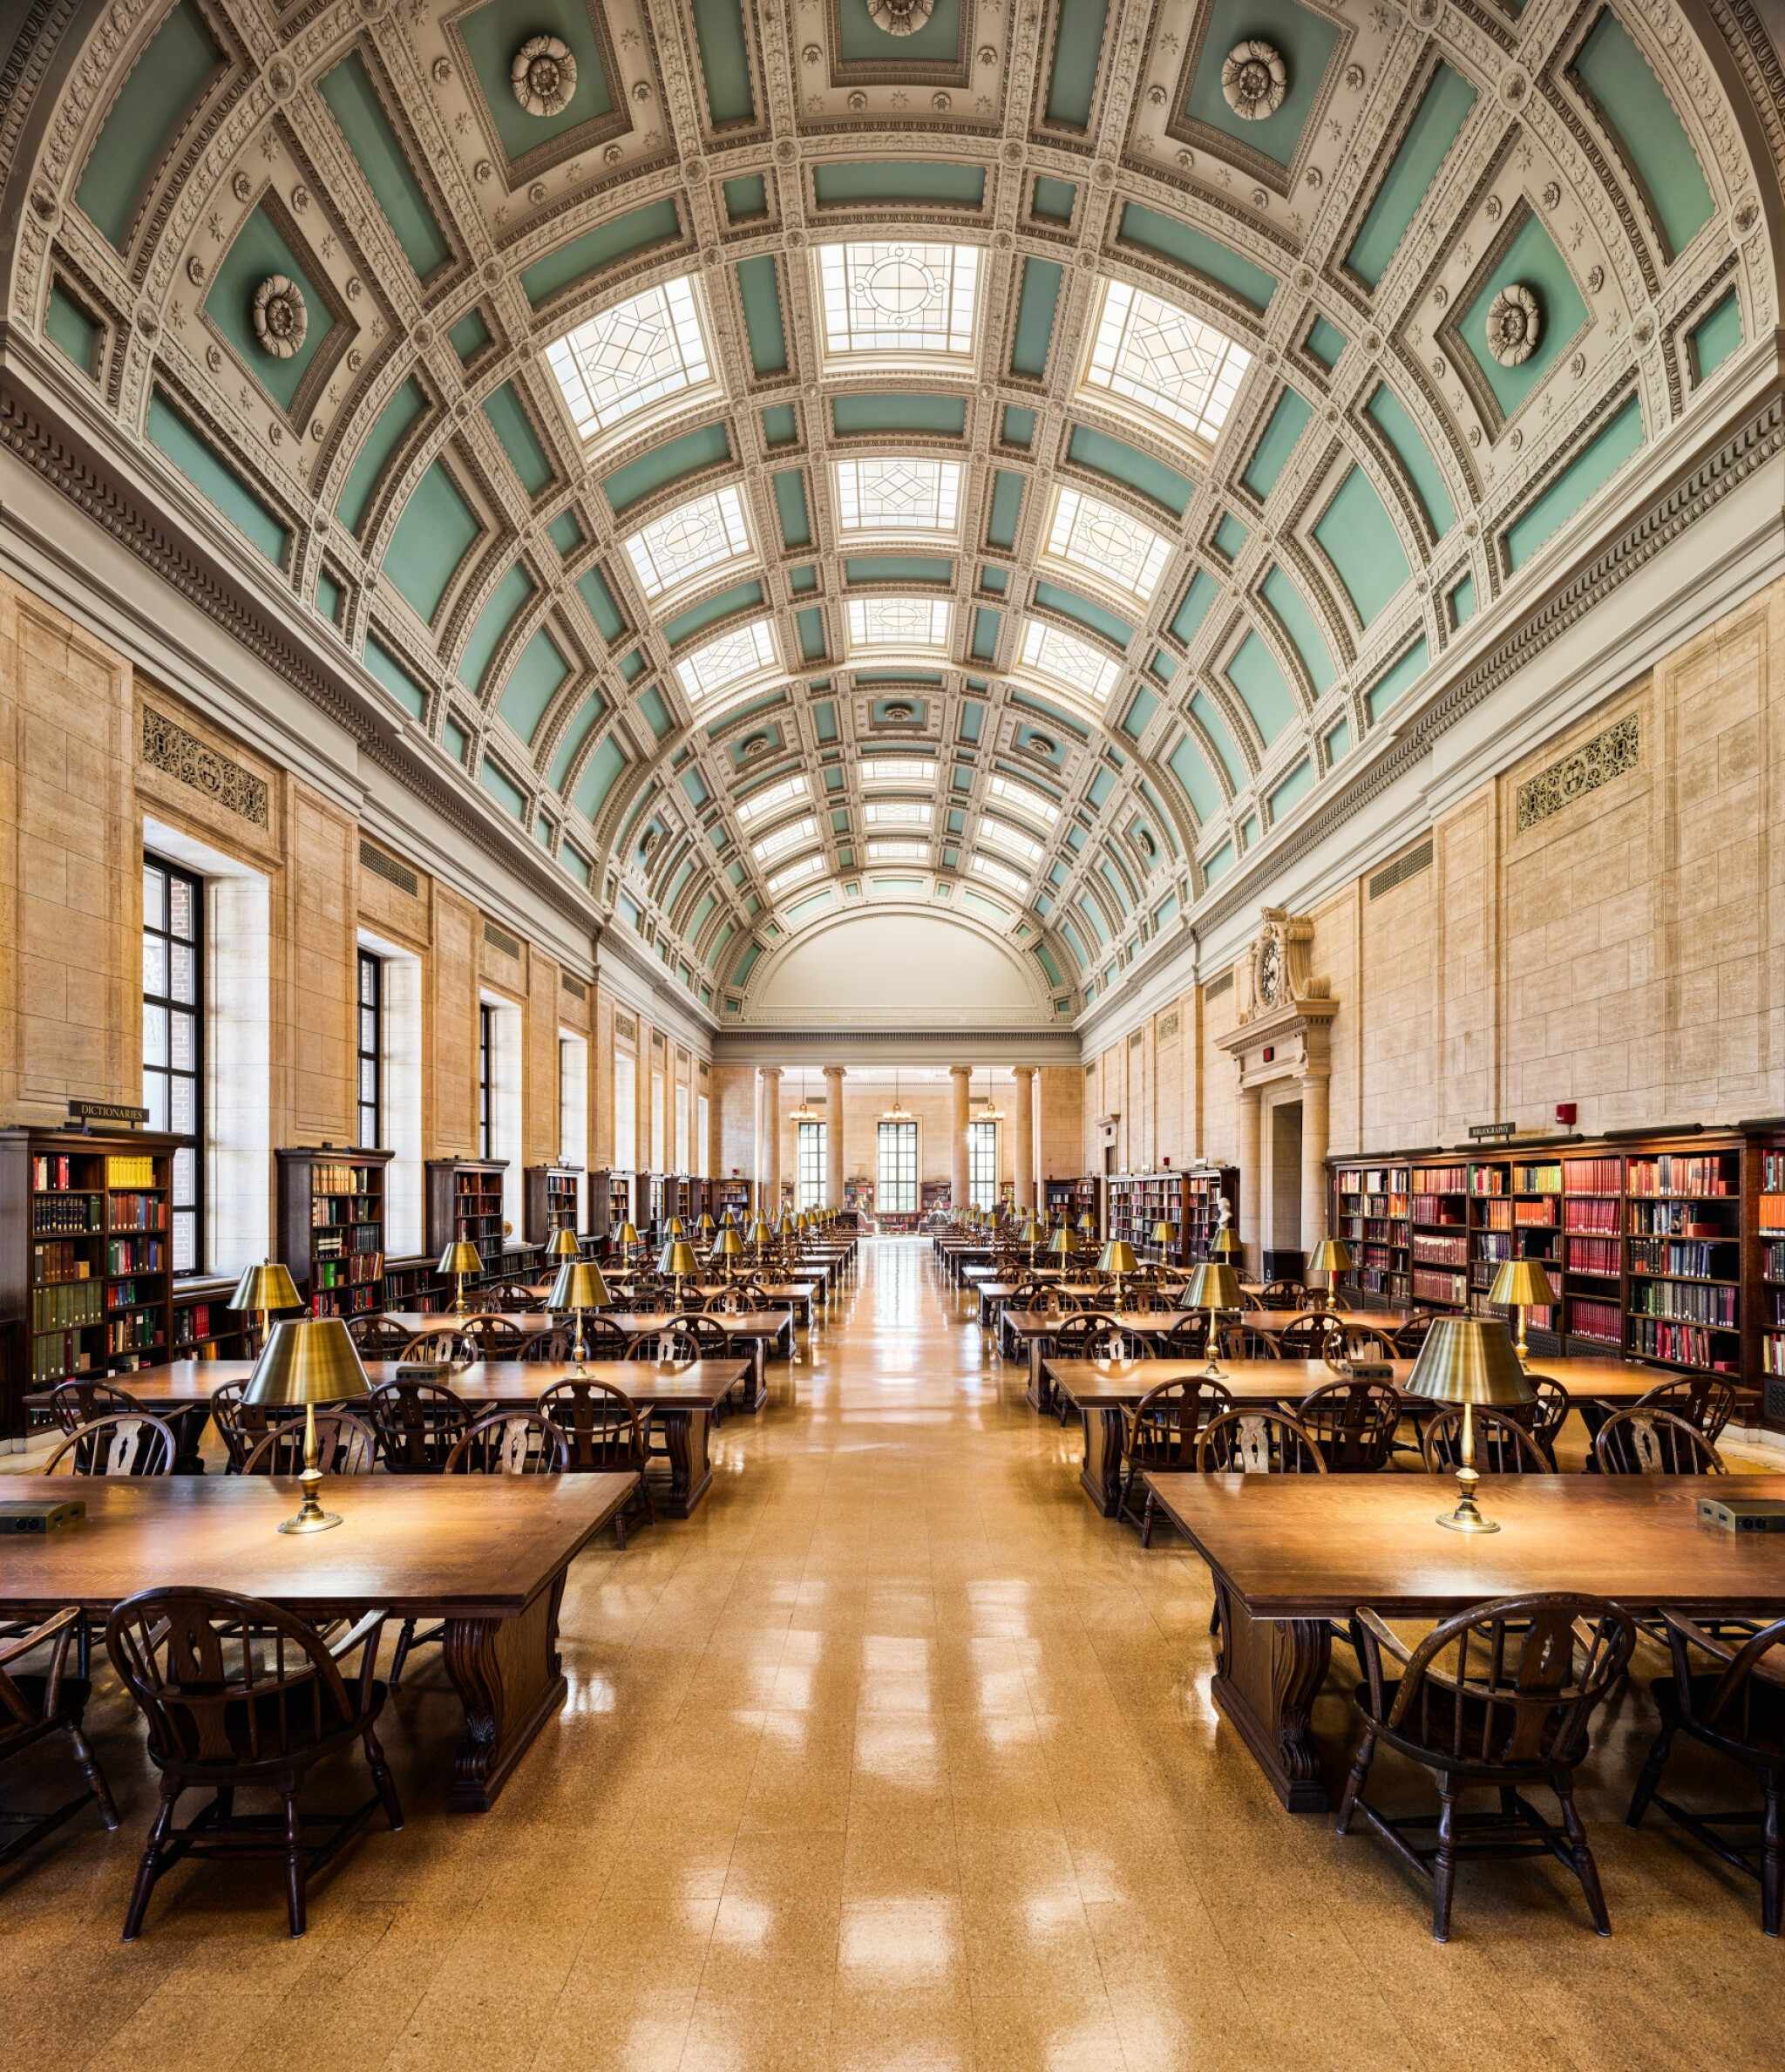 View full screen - View 1 of Lot 164. Loker Reading Room – Widener Library, Harvard University, Cambridge.